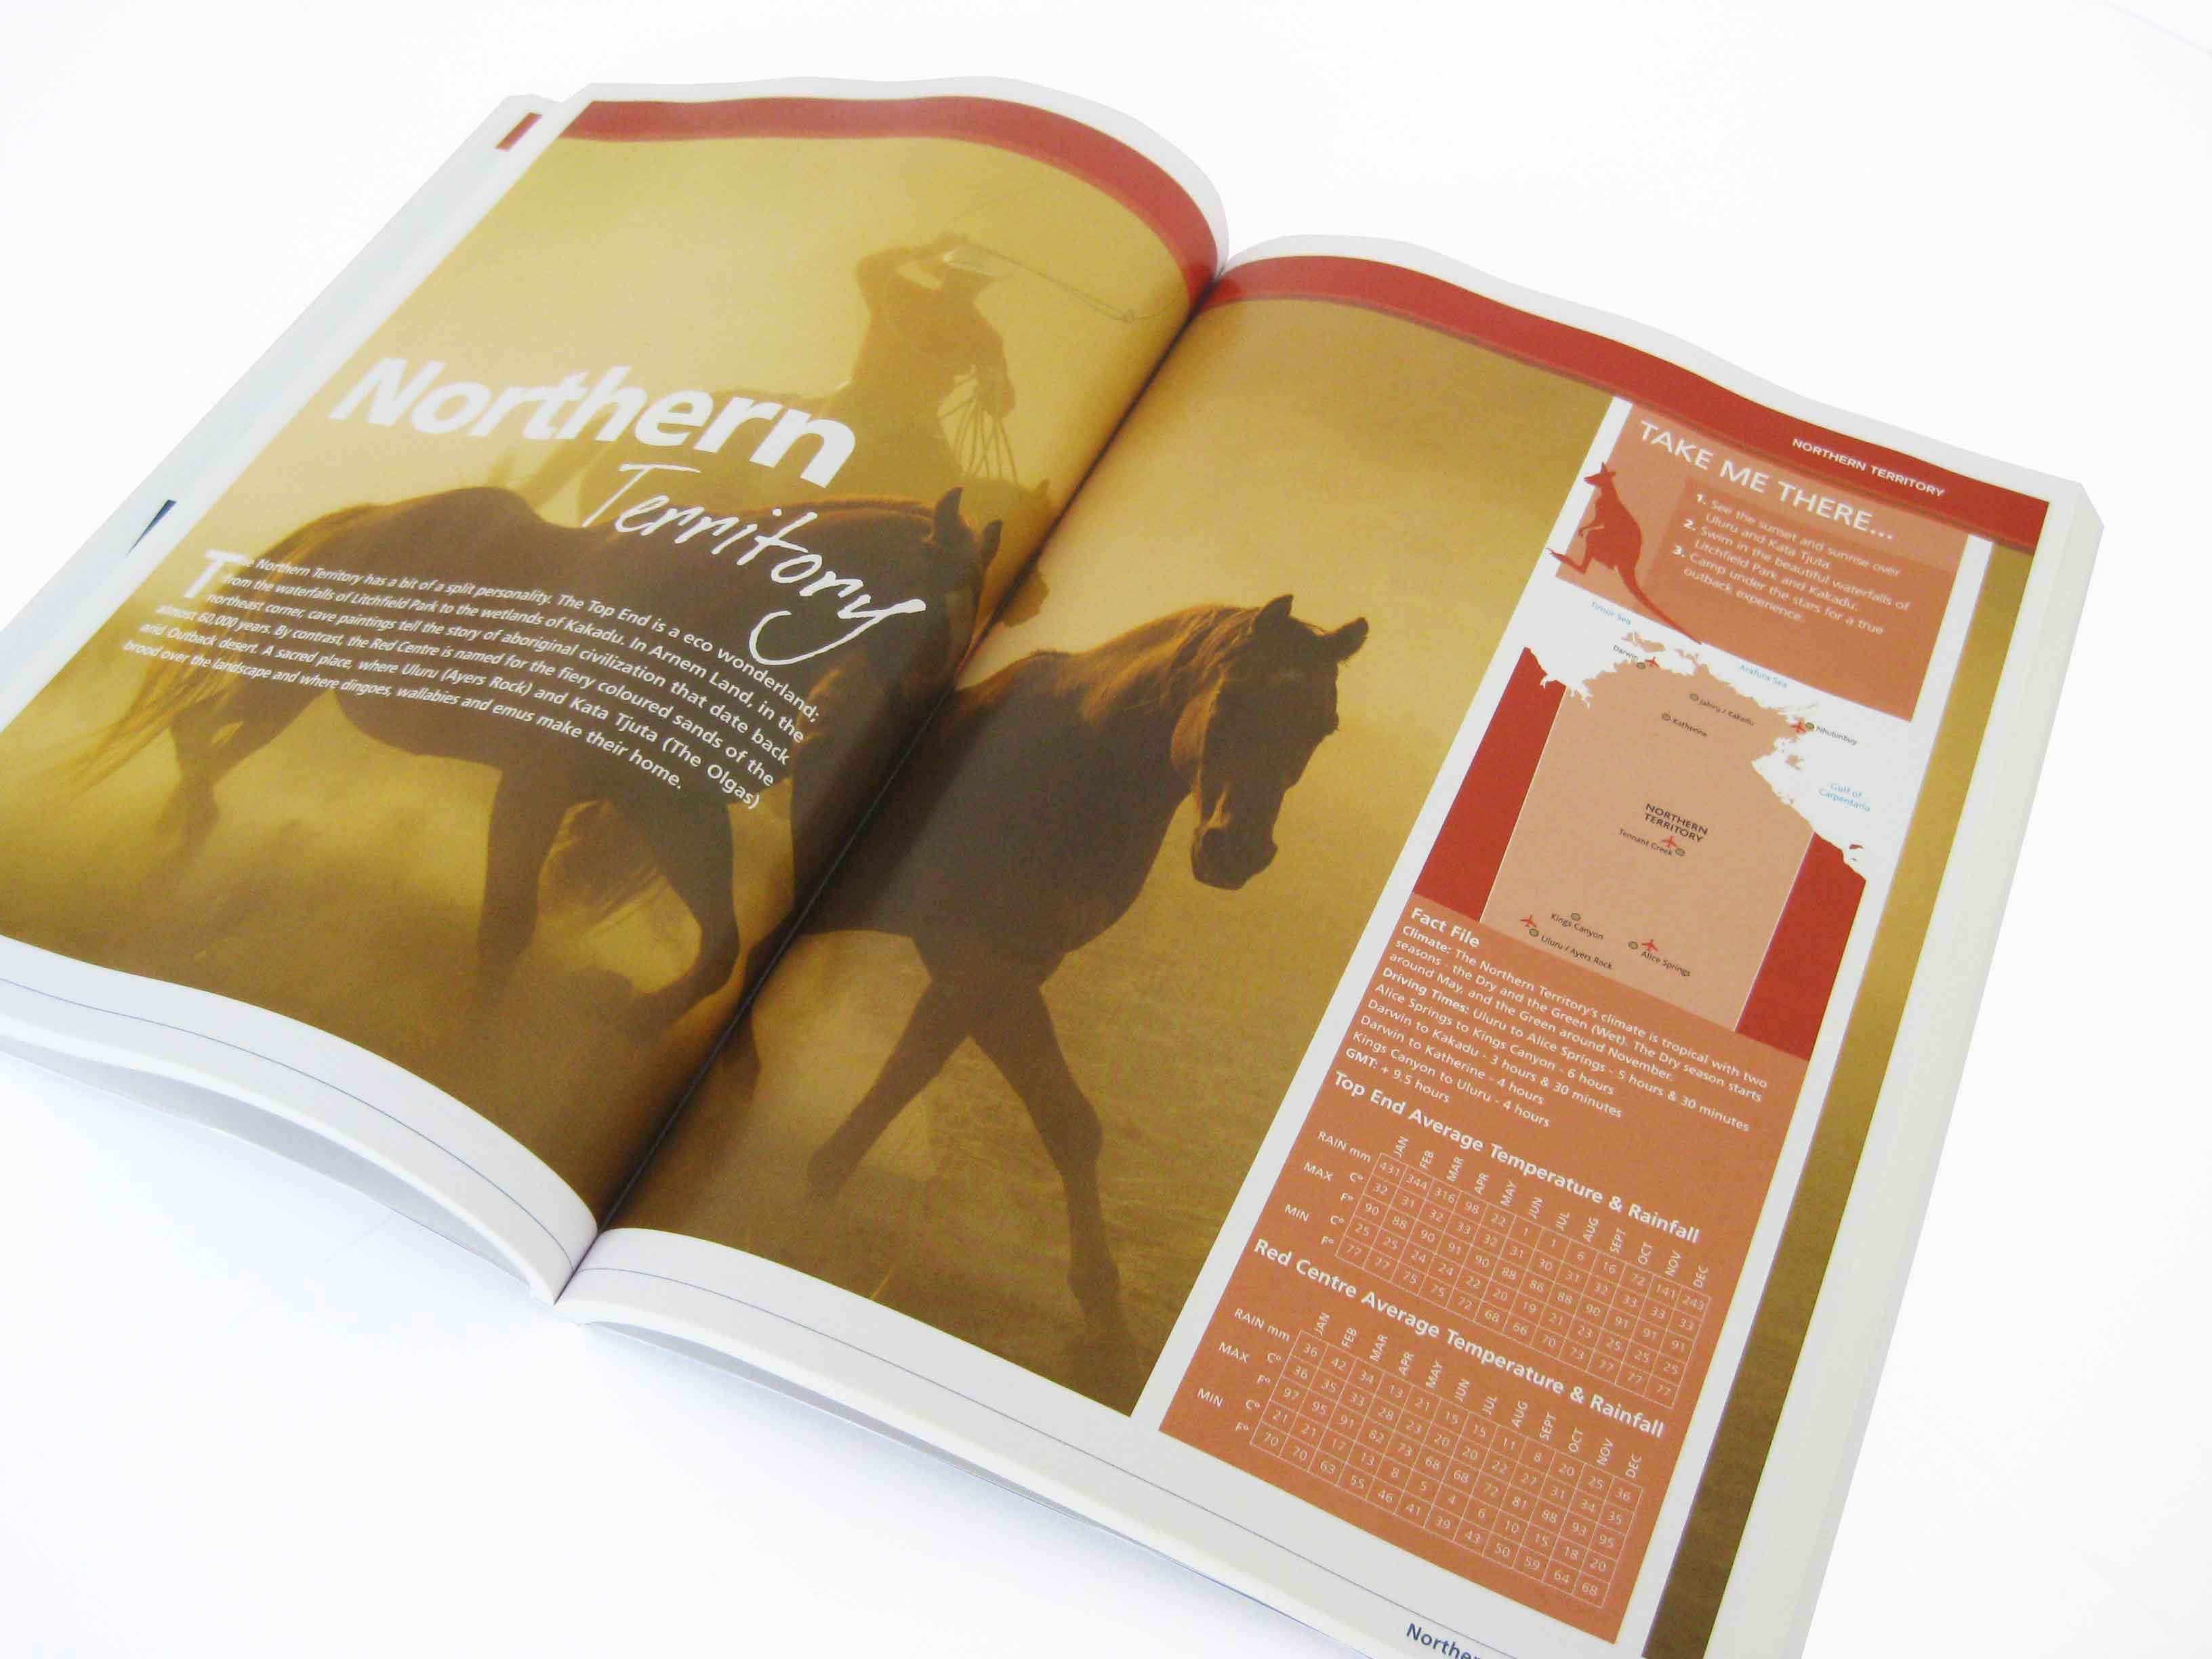 Austravel brochure spread2